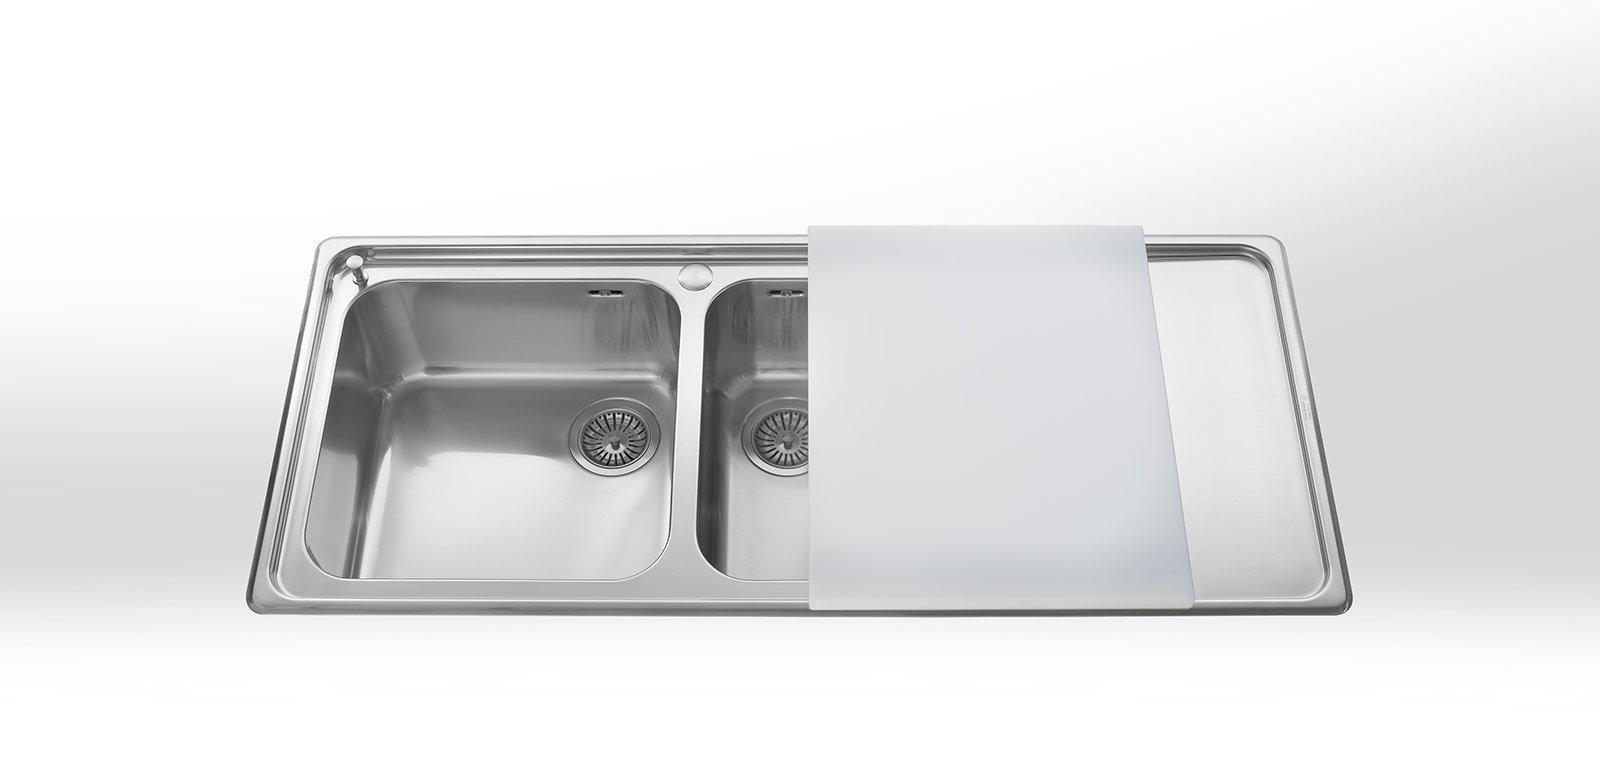 Mobili angolari cucine ikea : mobili angolari cucine ikea. mobili ...